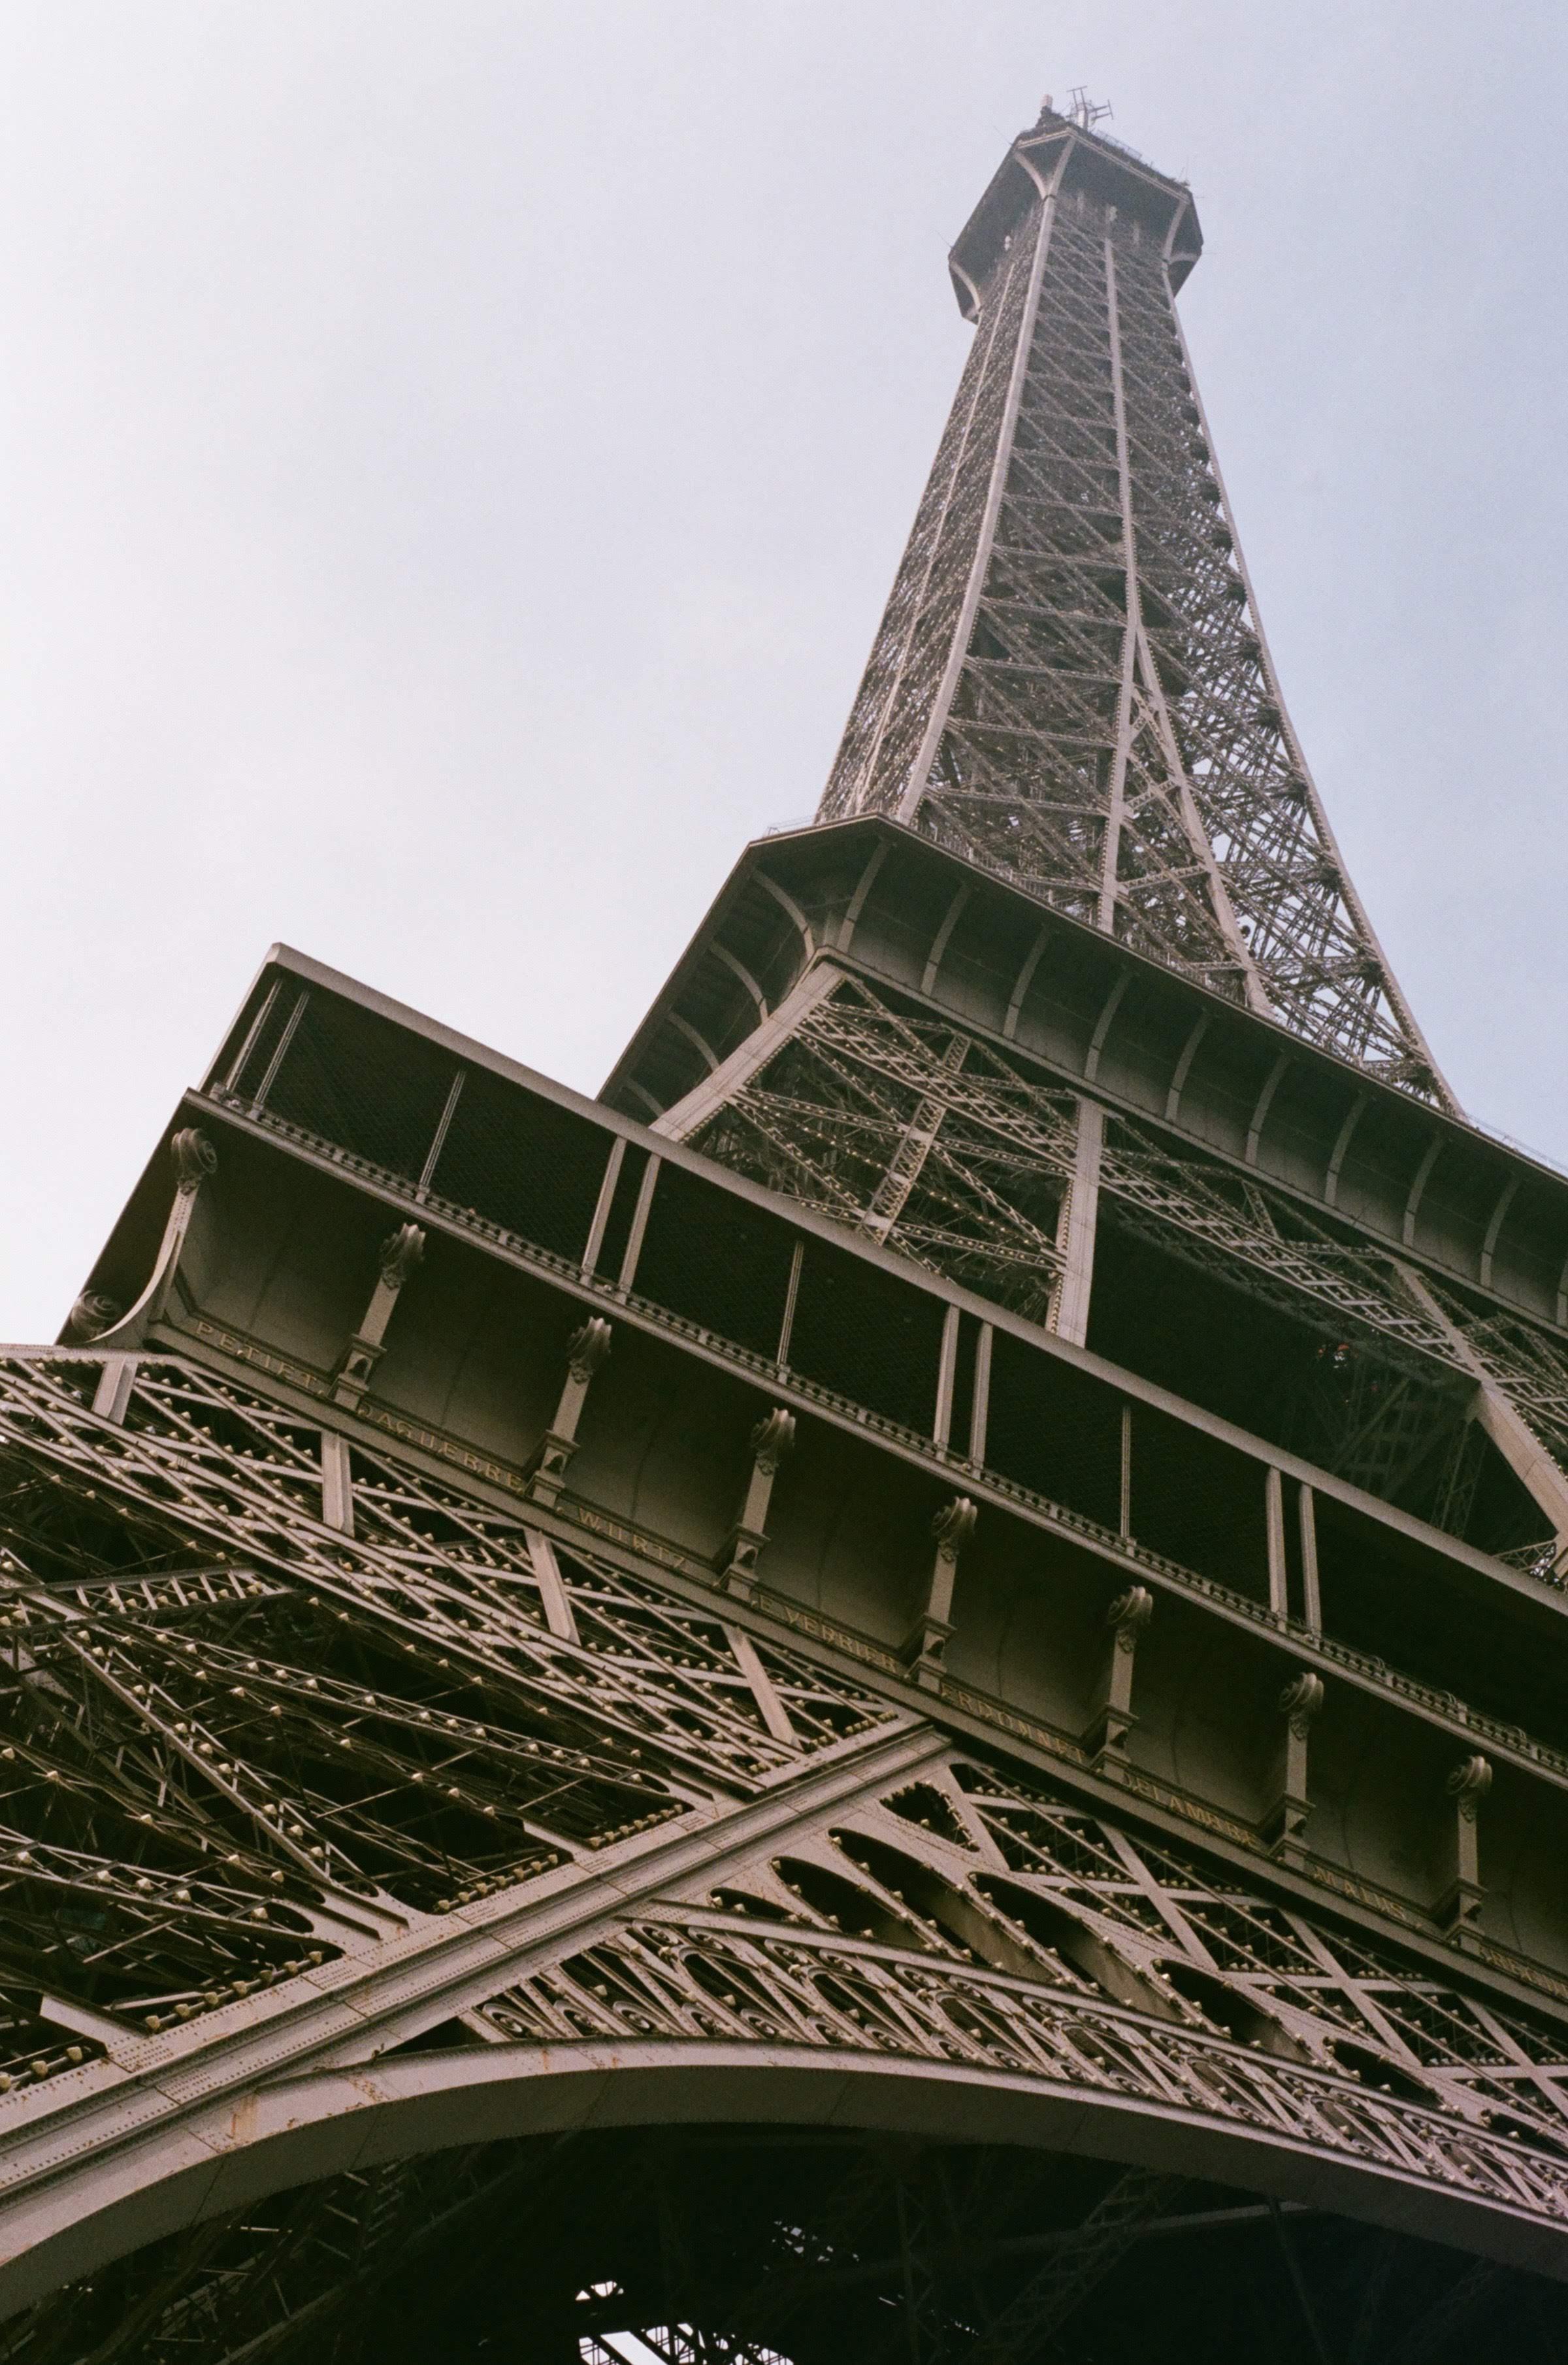 Wide angle shots of the Eiffel Tower taken on my Minolta were lost.